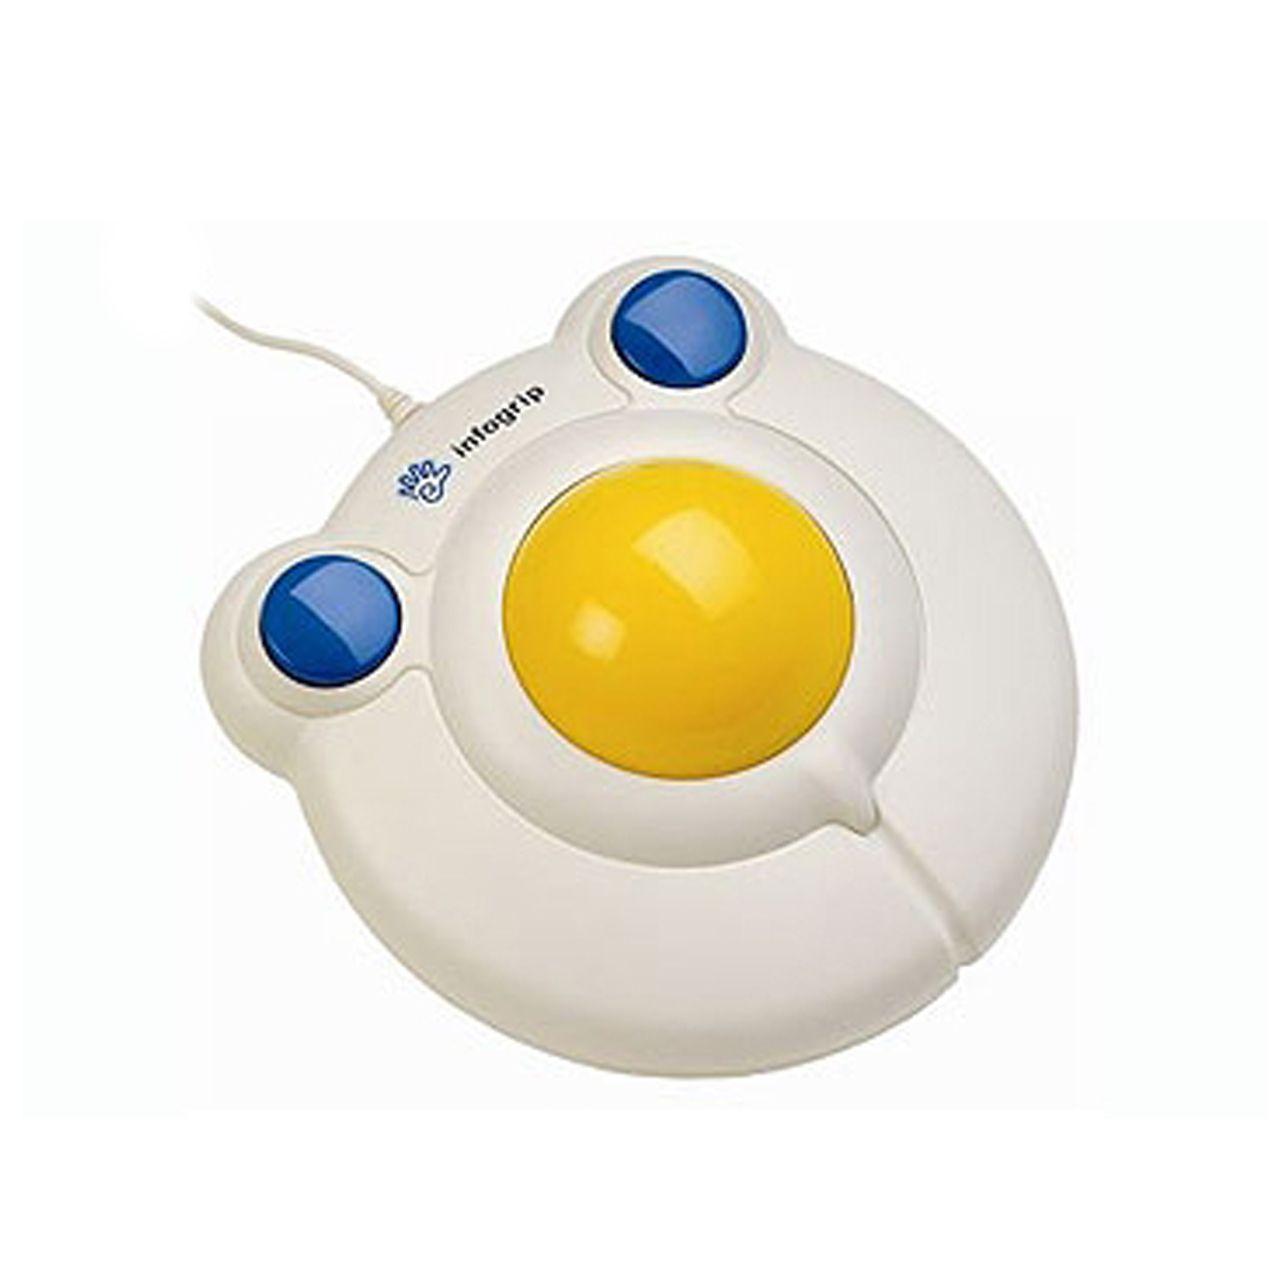 Bic trackball kidsball5 muis ERKATRA101 0001s 0000 Voor 1